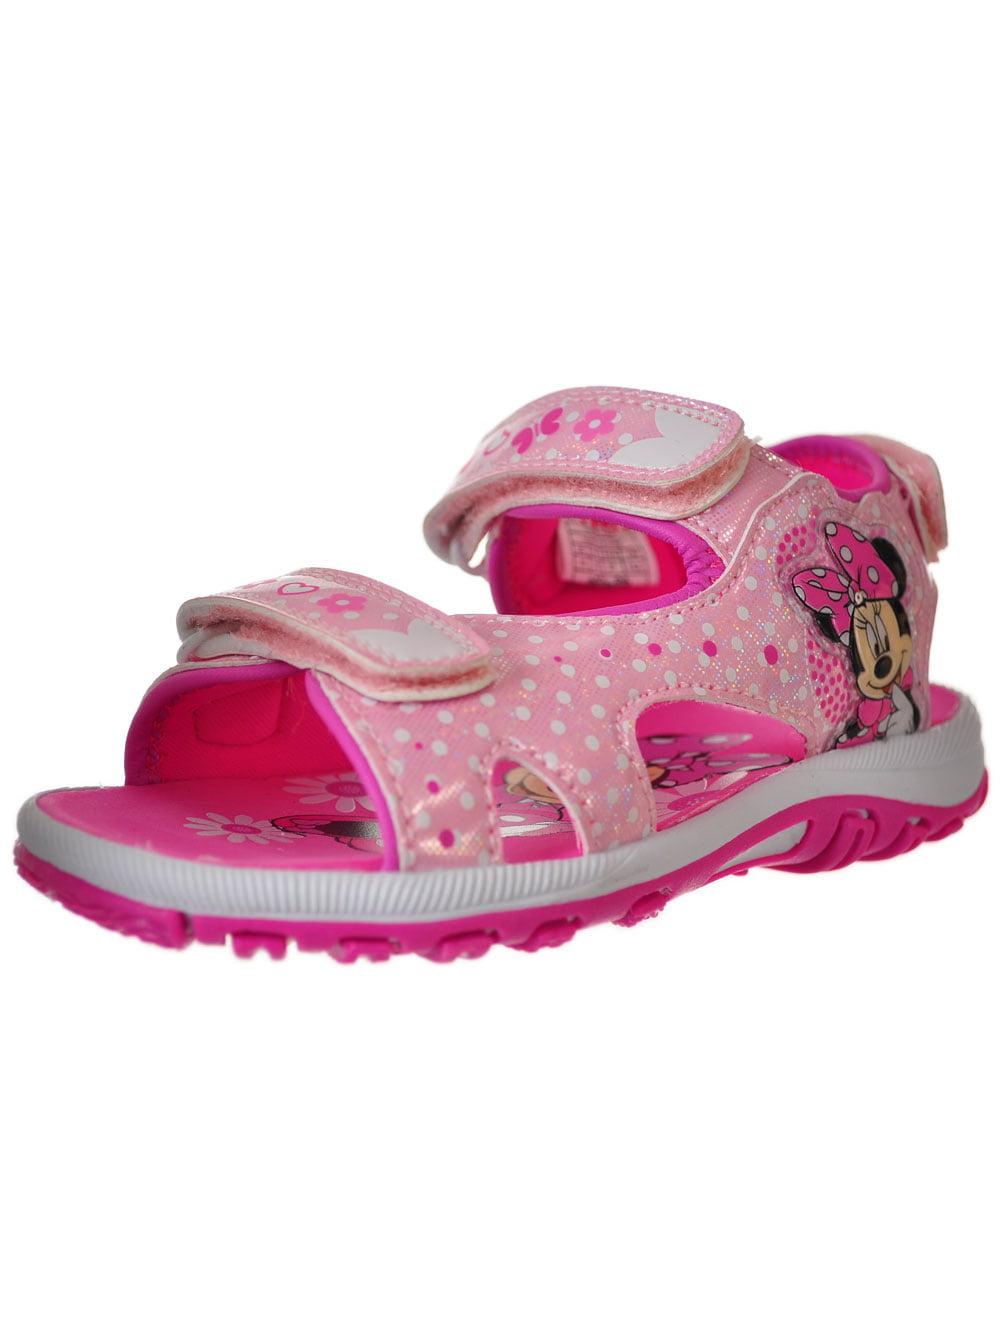 Disney Minnie Mouse Girls' Sandals